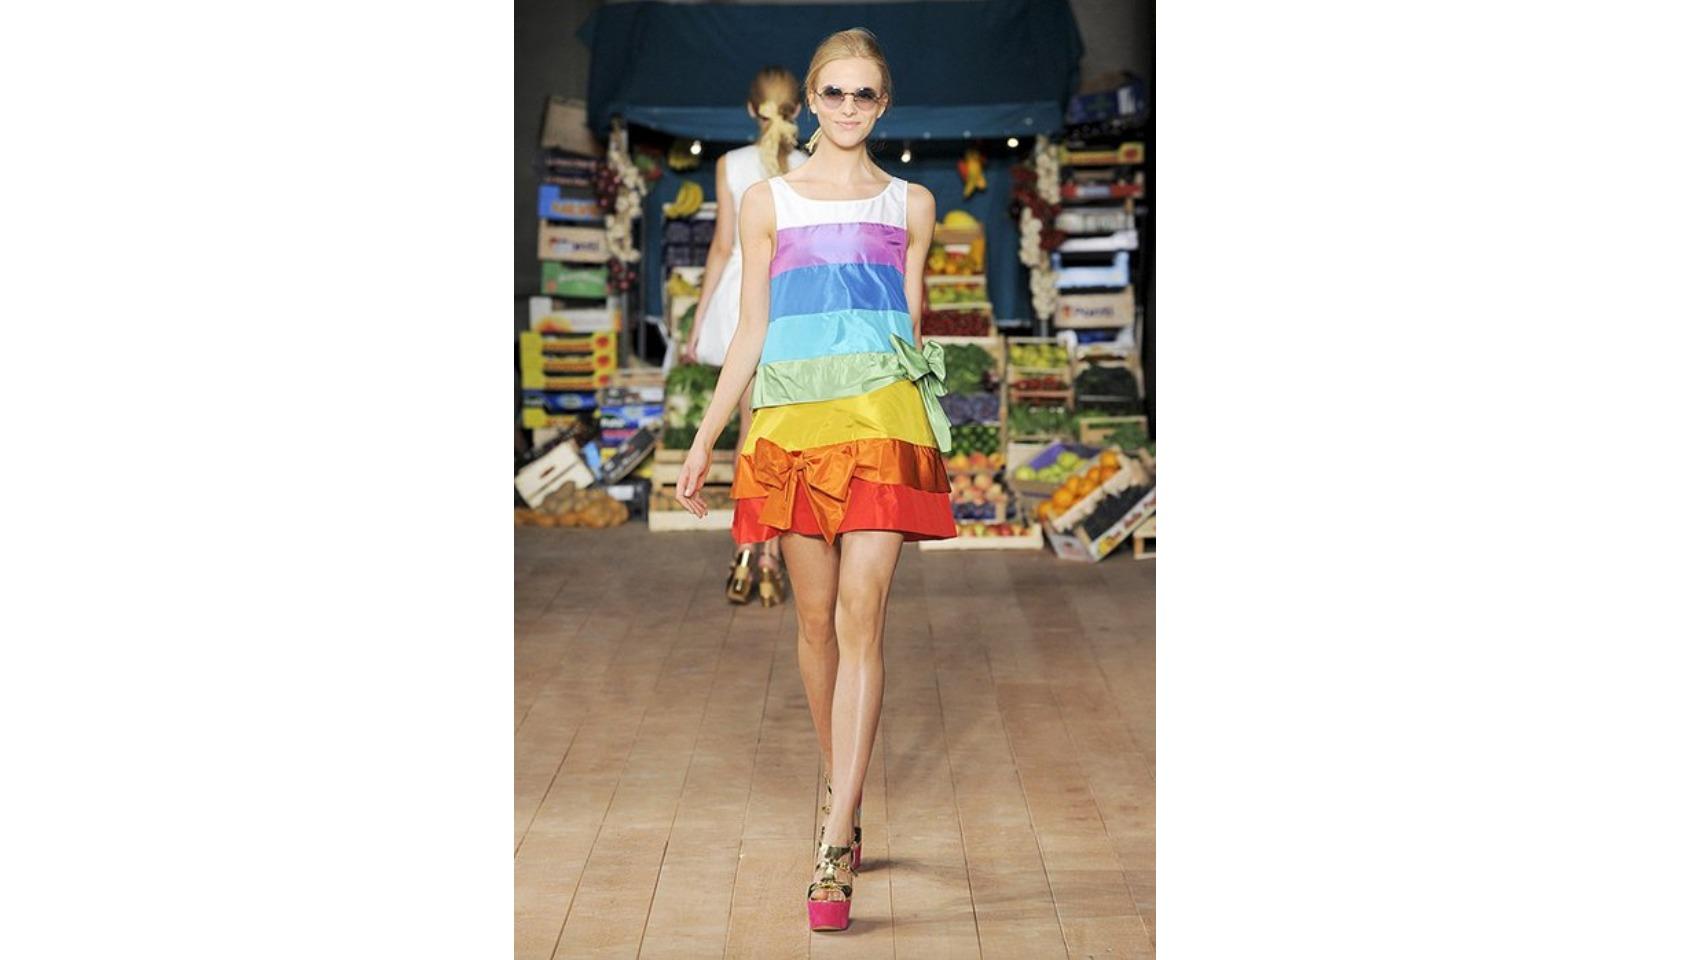 Vestido del desfile de Moschino Primavera/ Verano 2012.